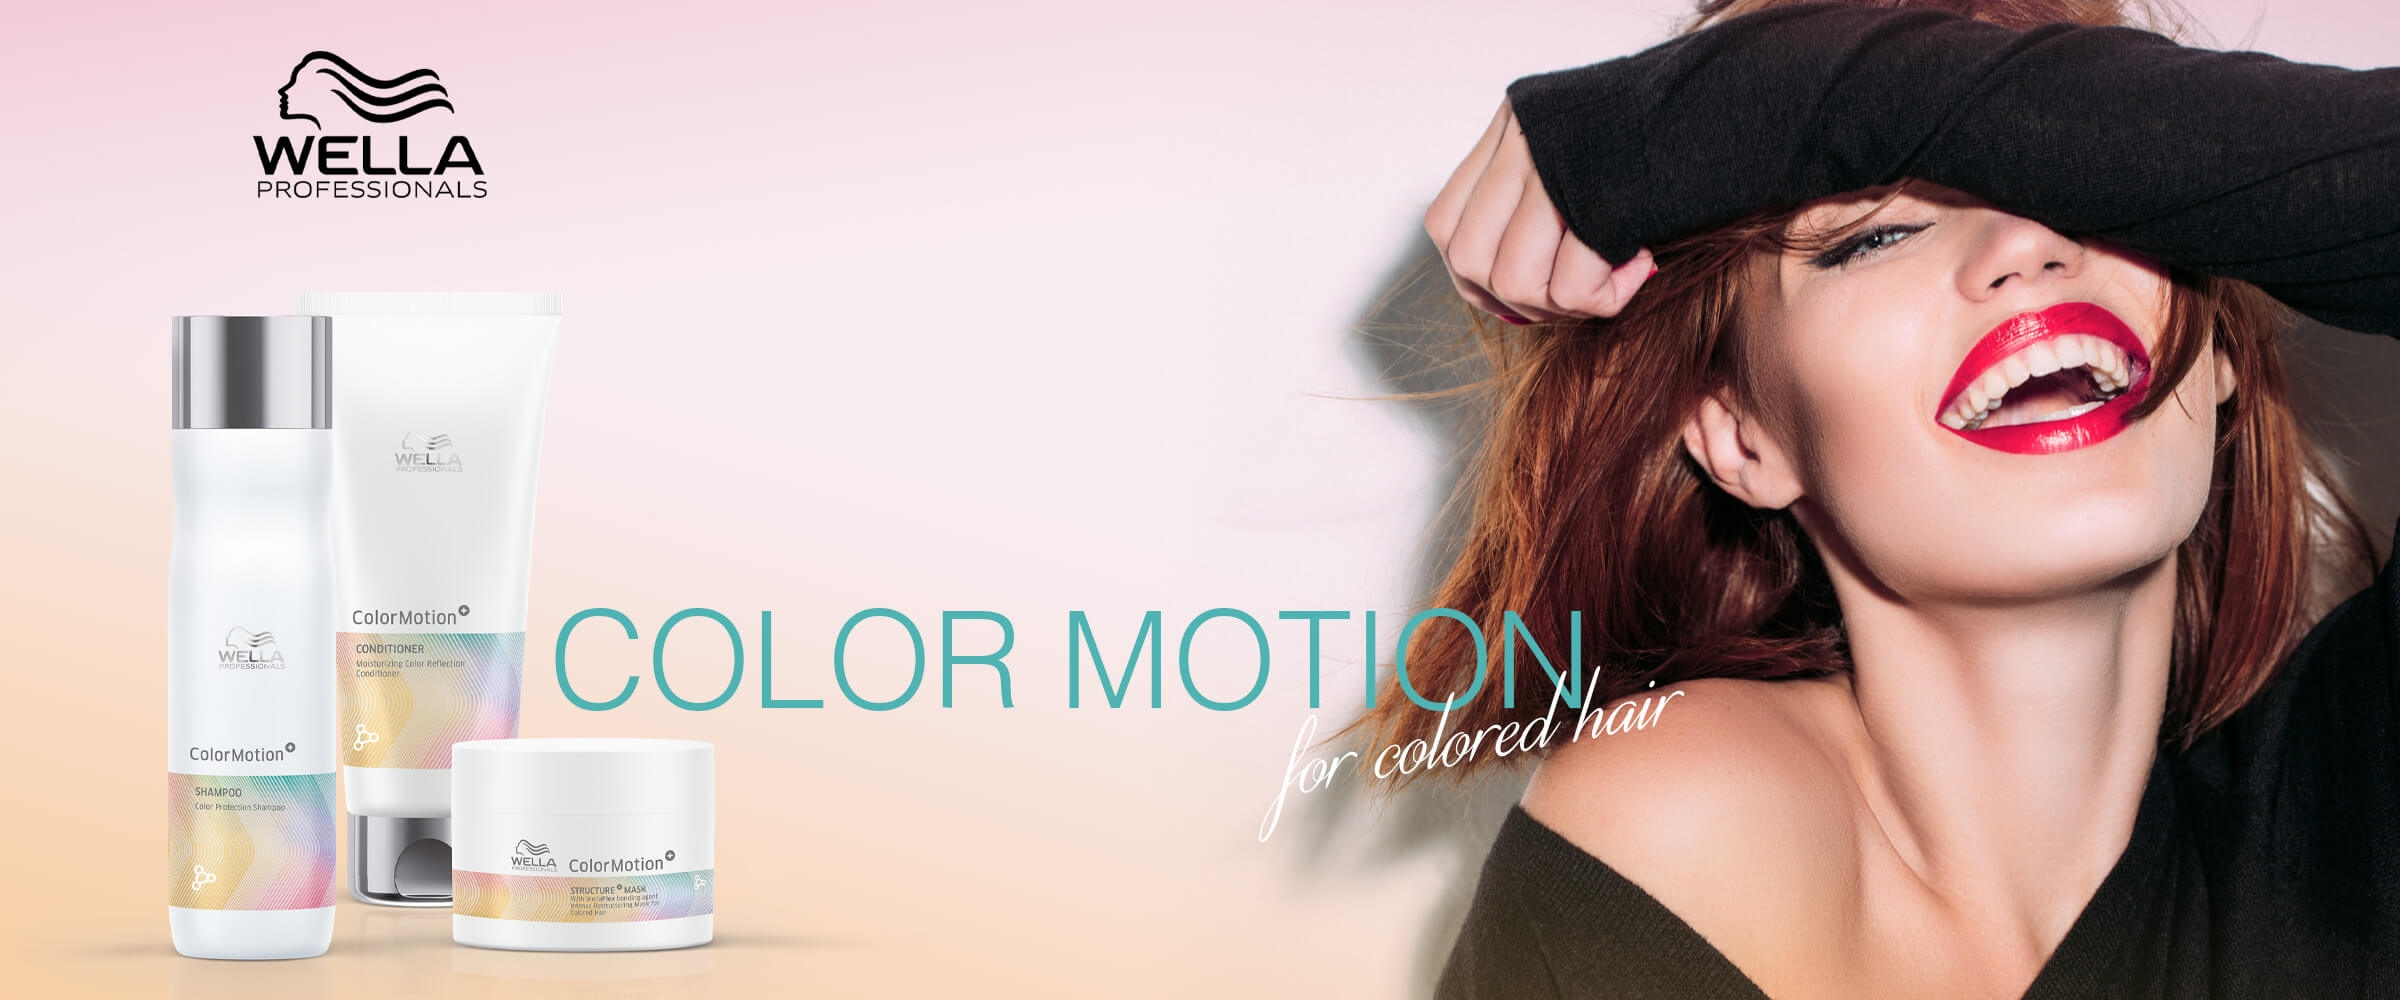 Wella Color Motion